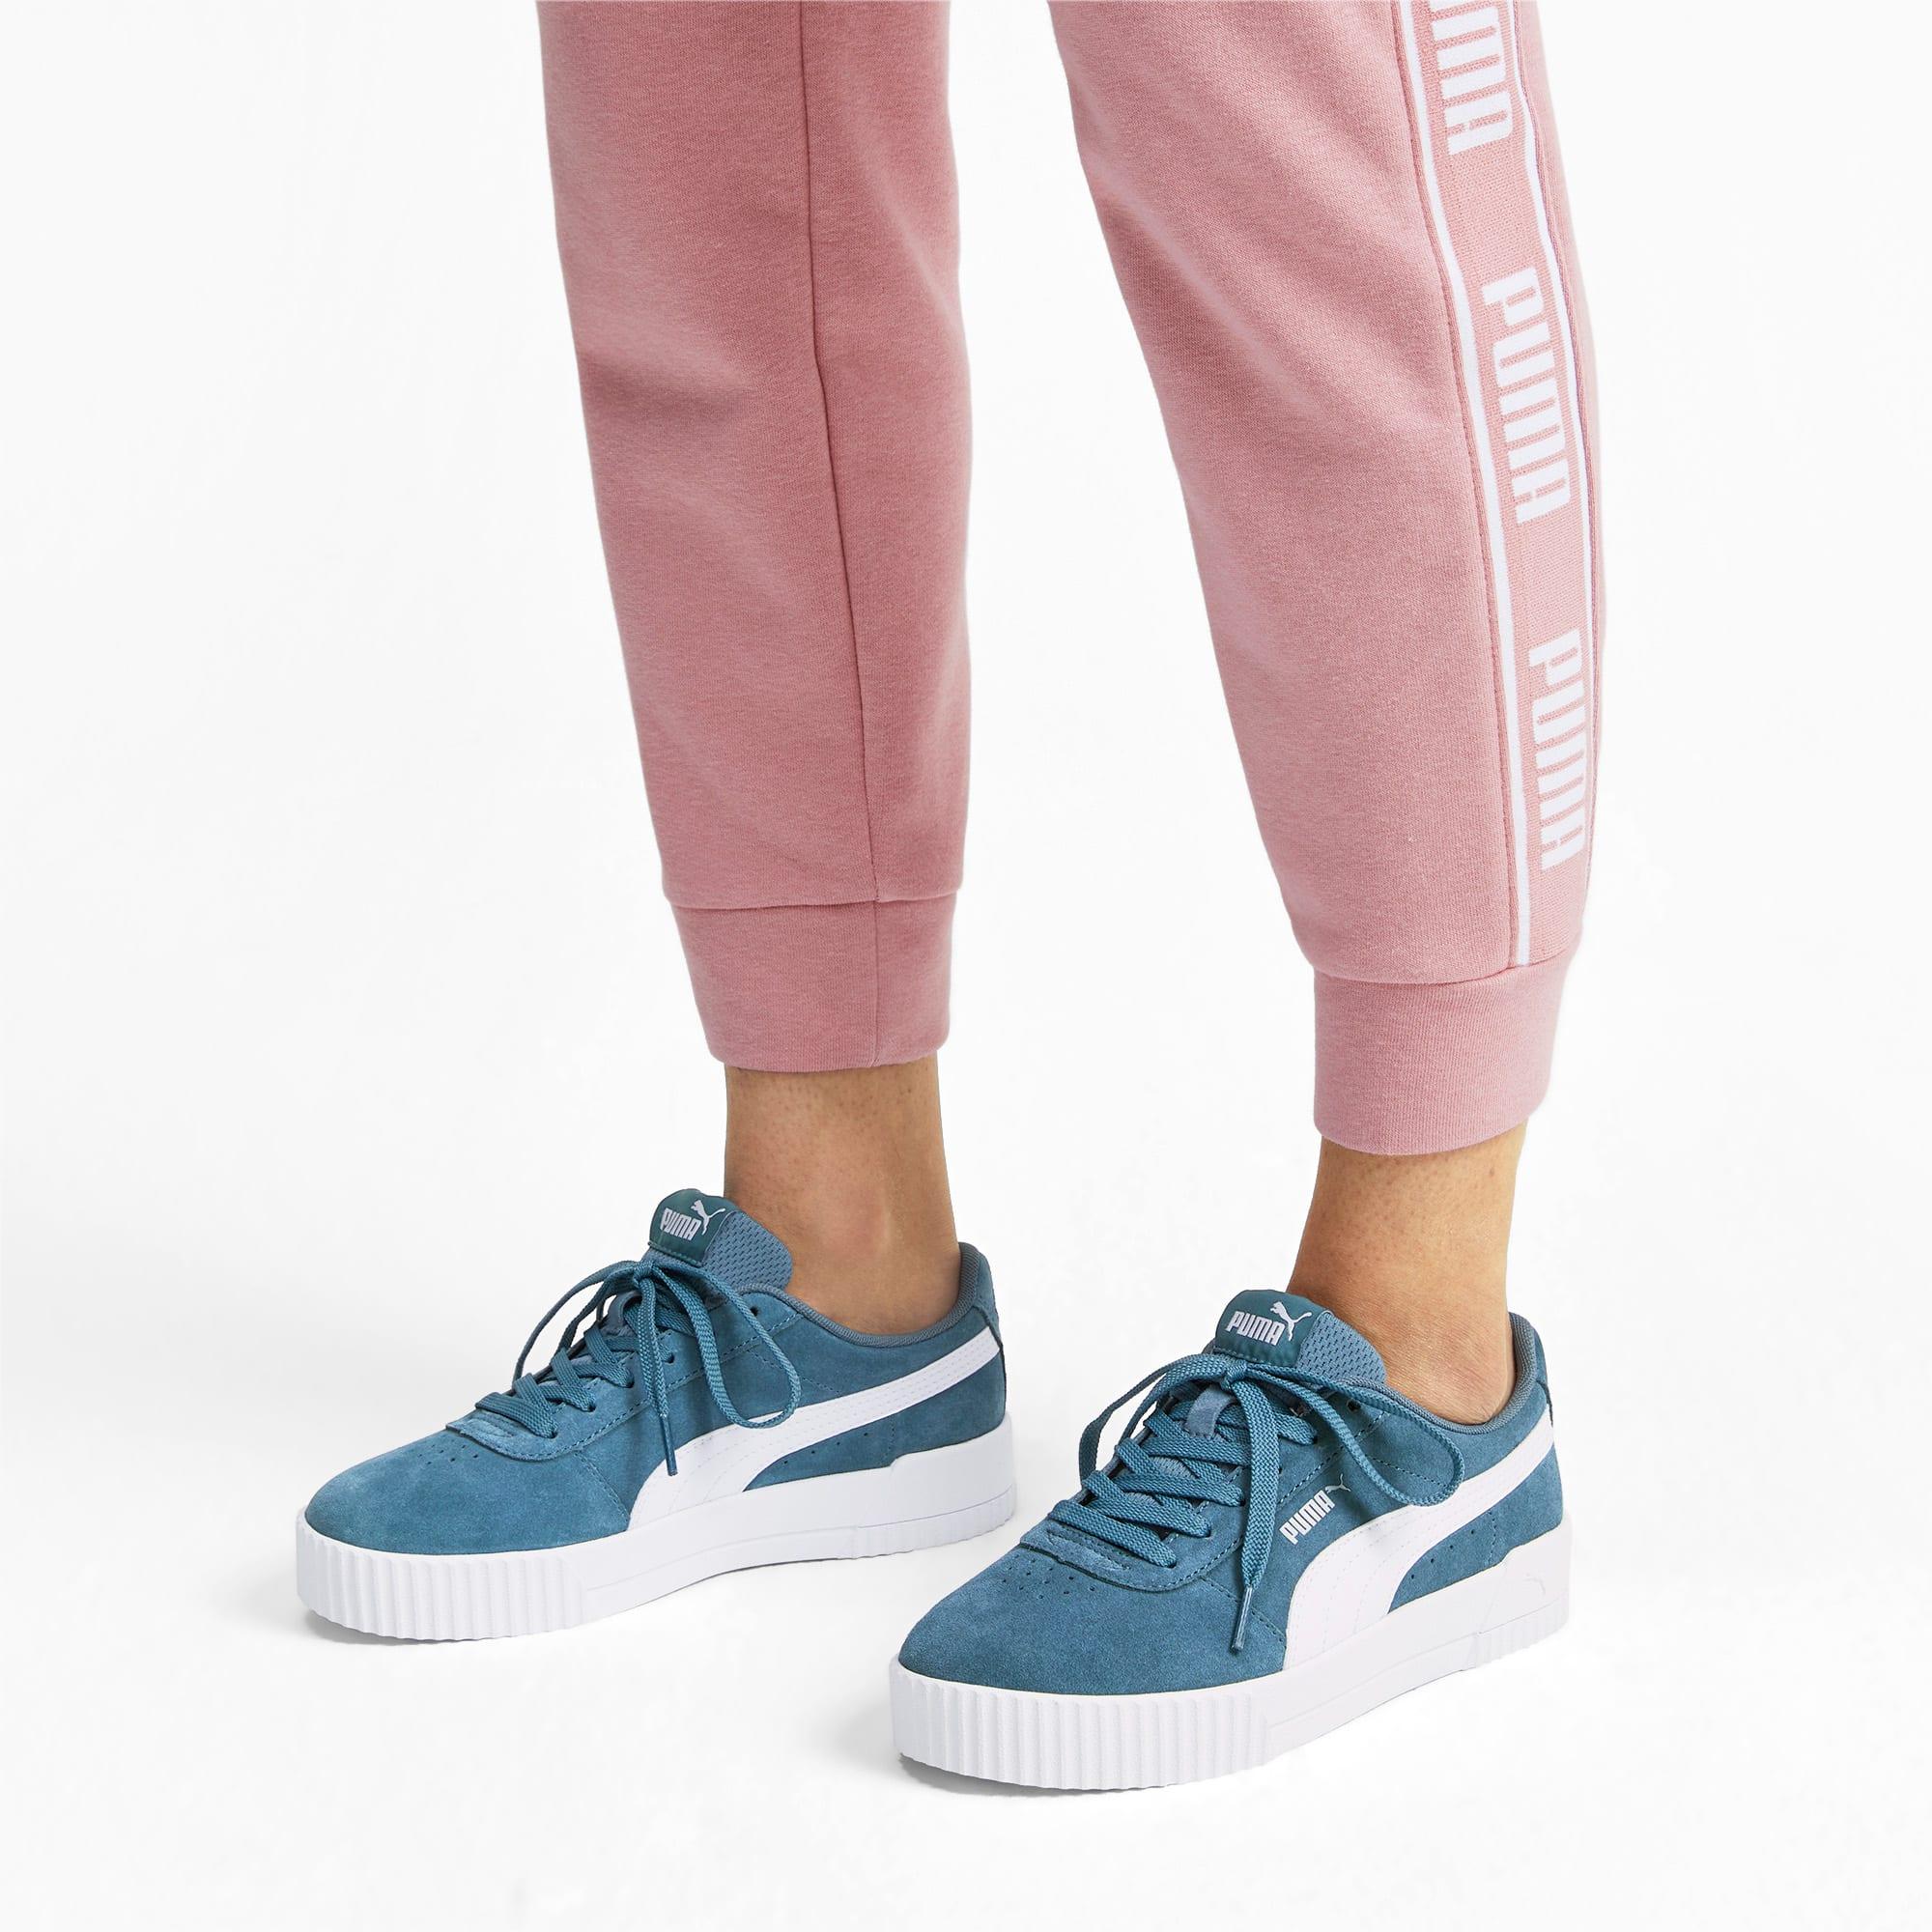 puma donna scarpe carina